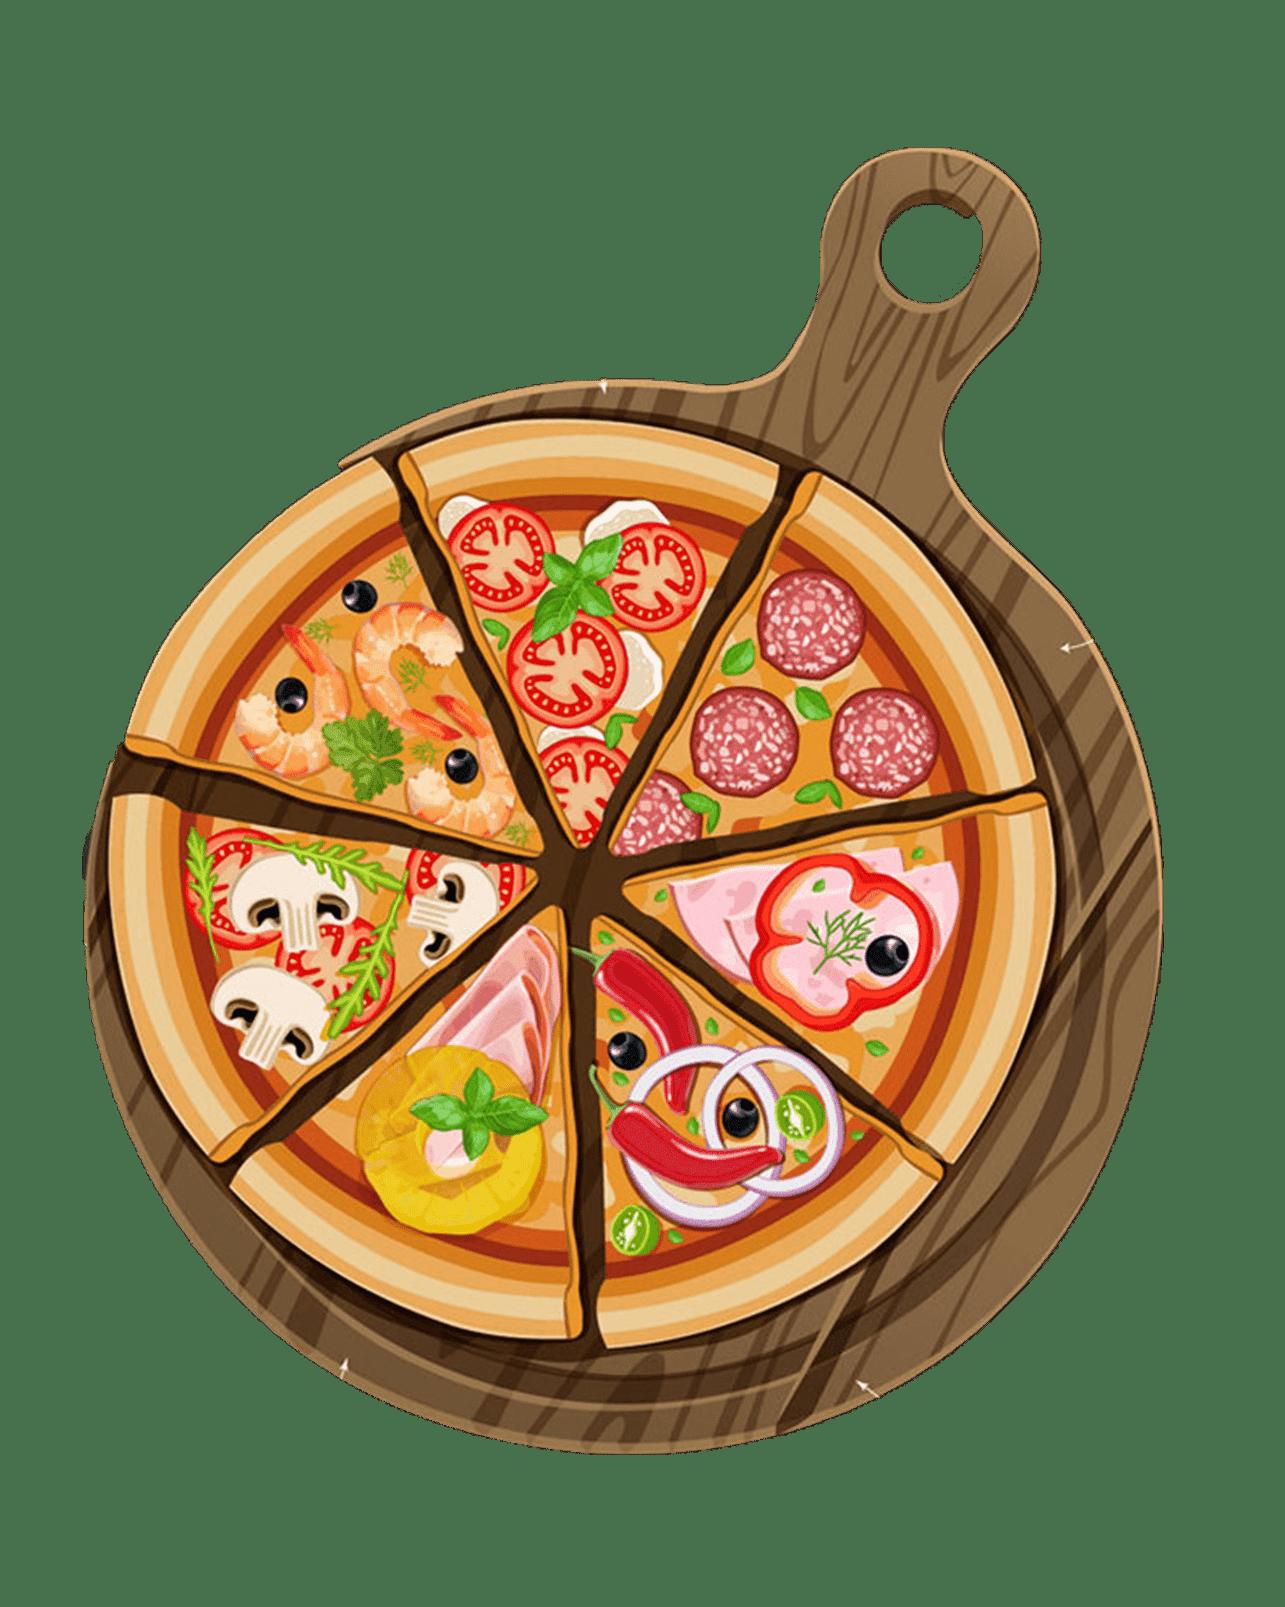 Pizza Slices Clipart Pizza Sicilian Pizza Italian Cuisine Cuisine Fast Food Free Png Images Desenho Festa Italiana Pizza